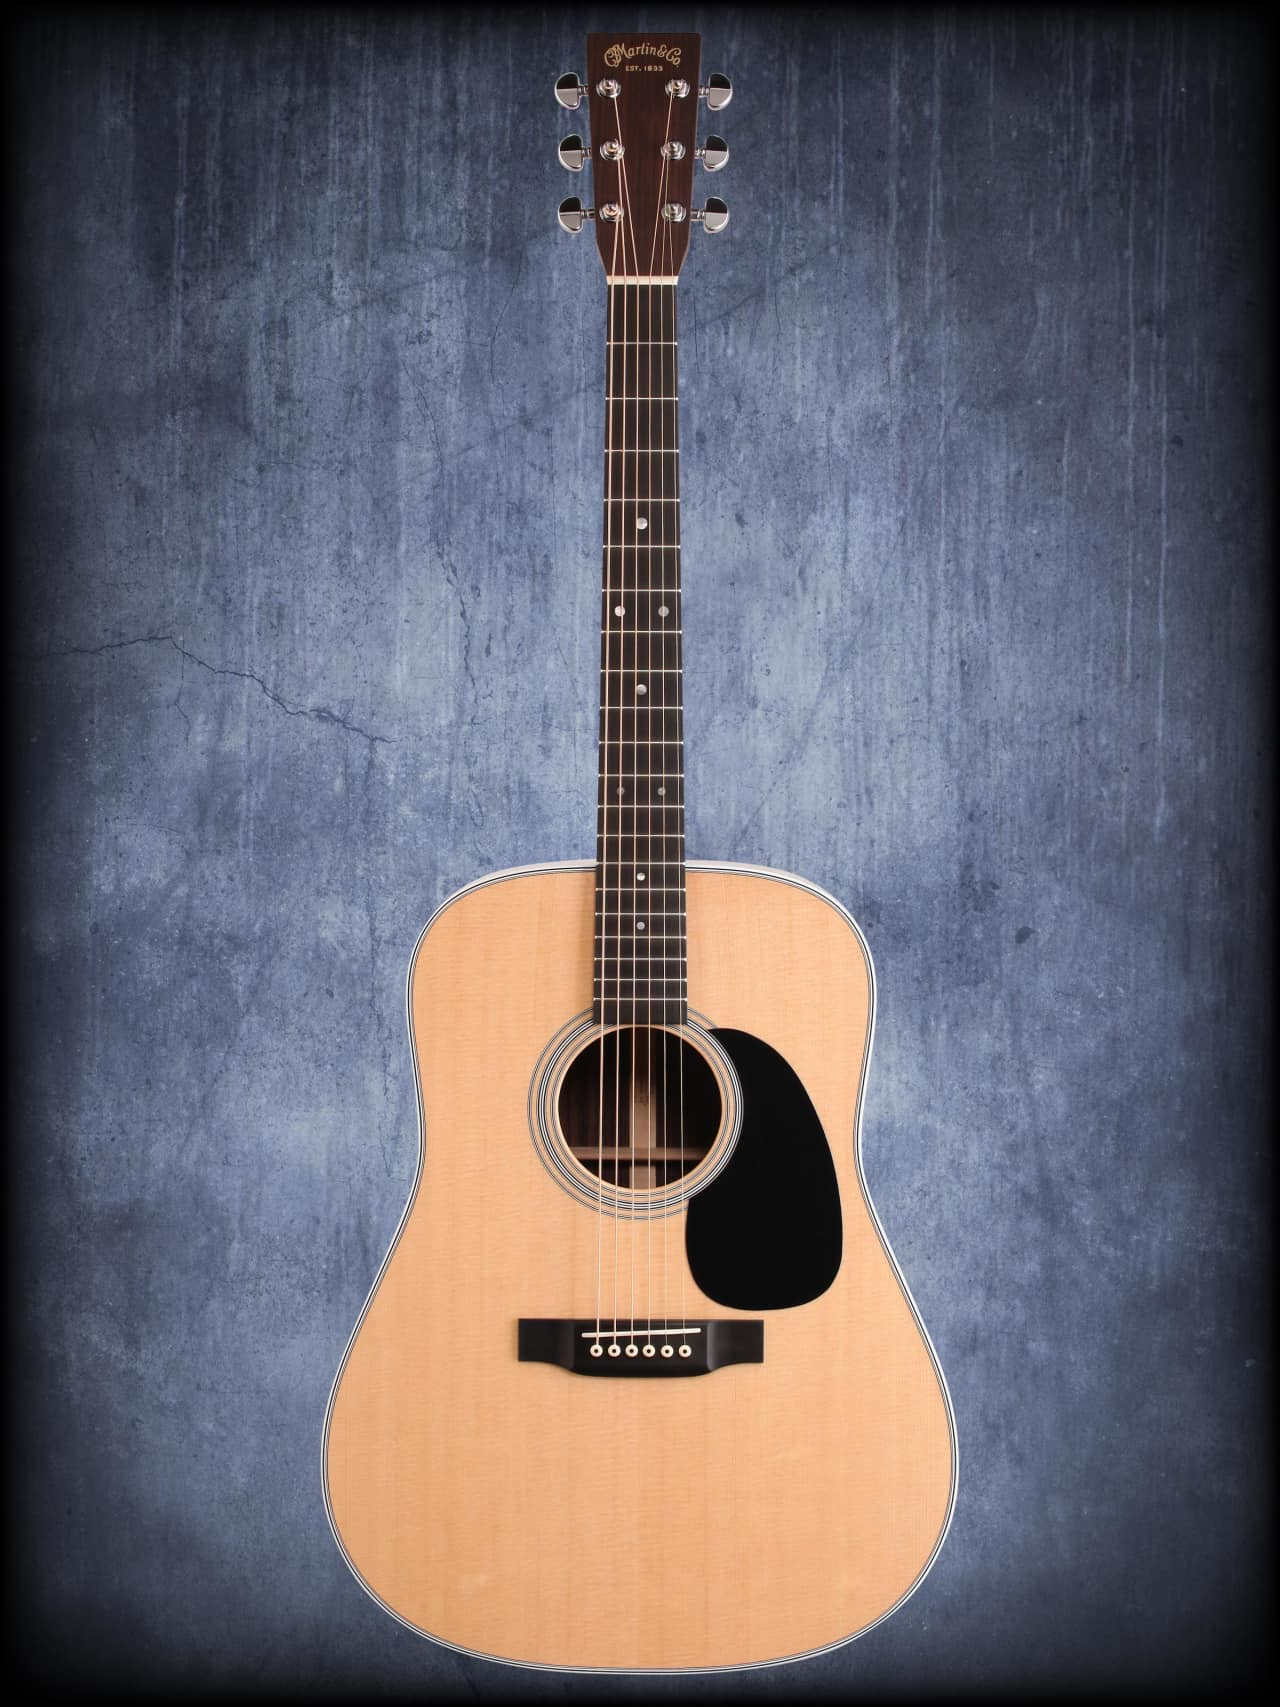 Auto Body Shops >> Martin D28 Acoustic Guitar with Case | Reverb